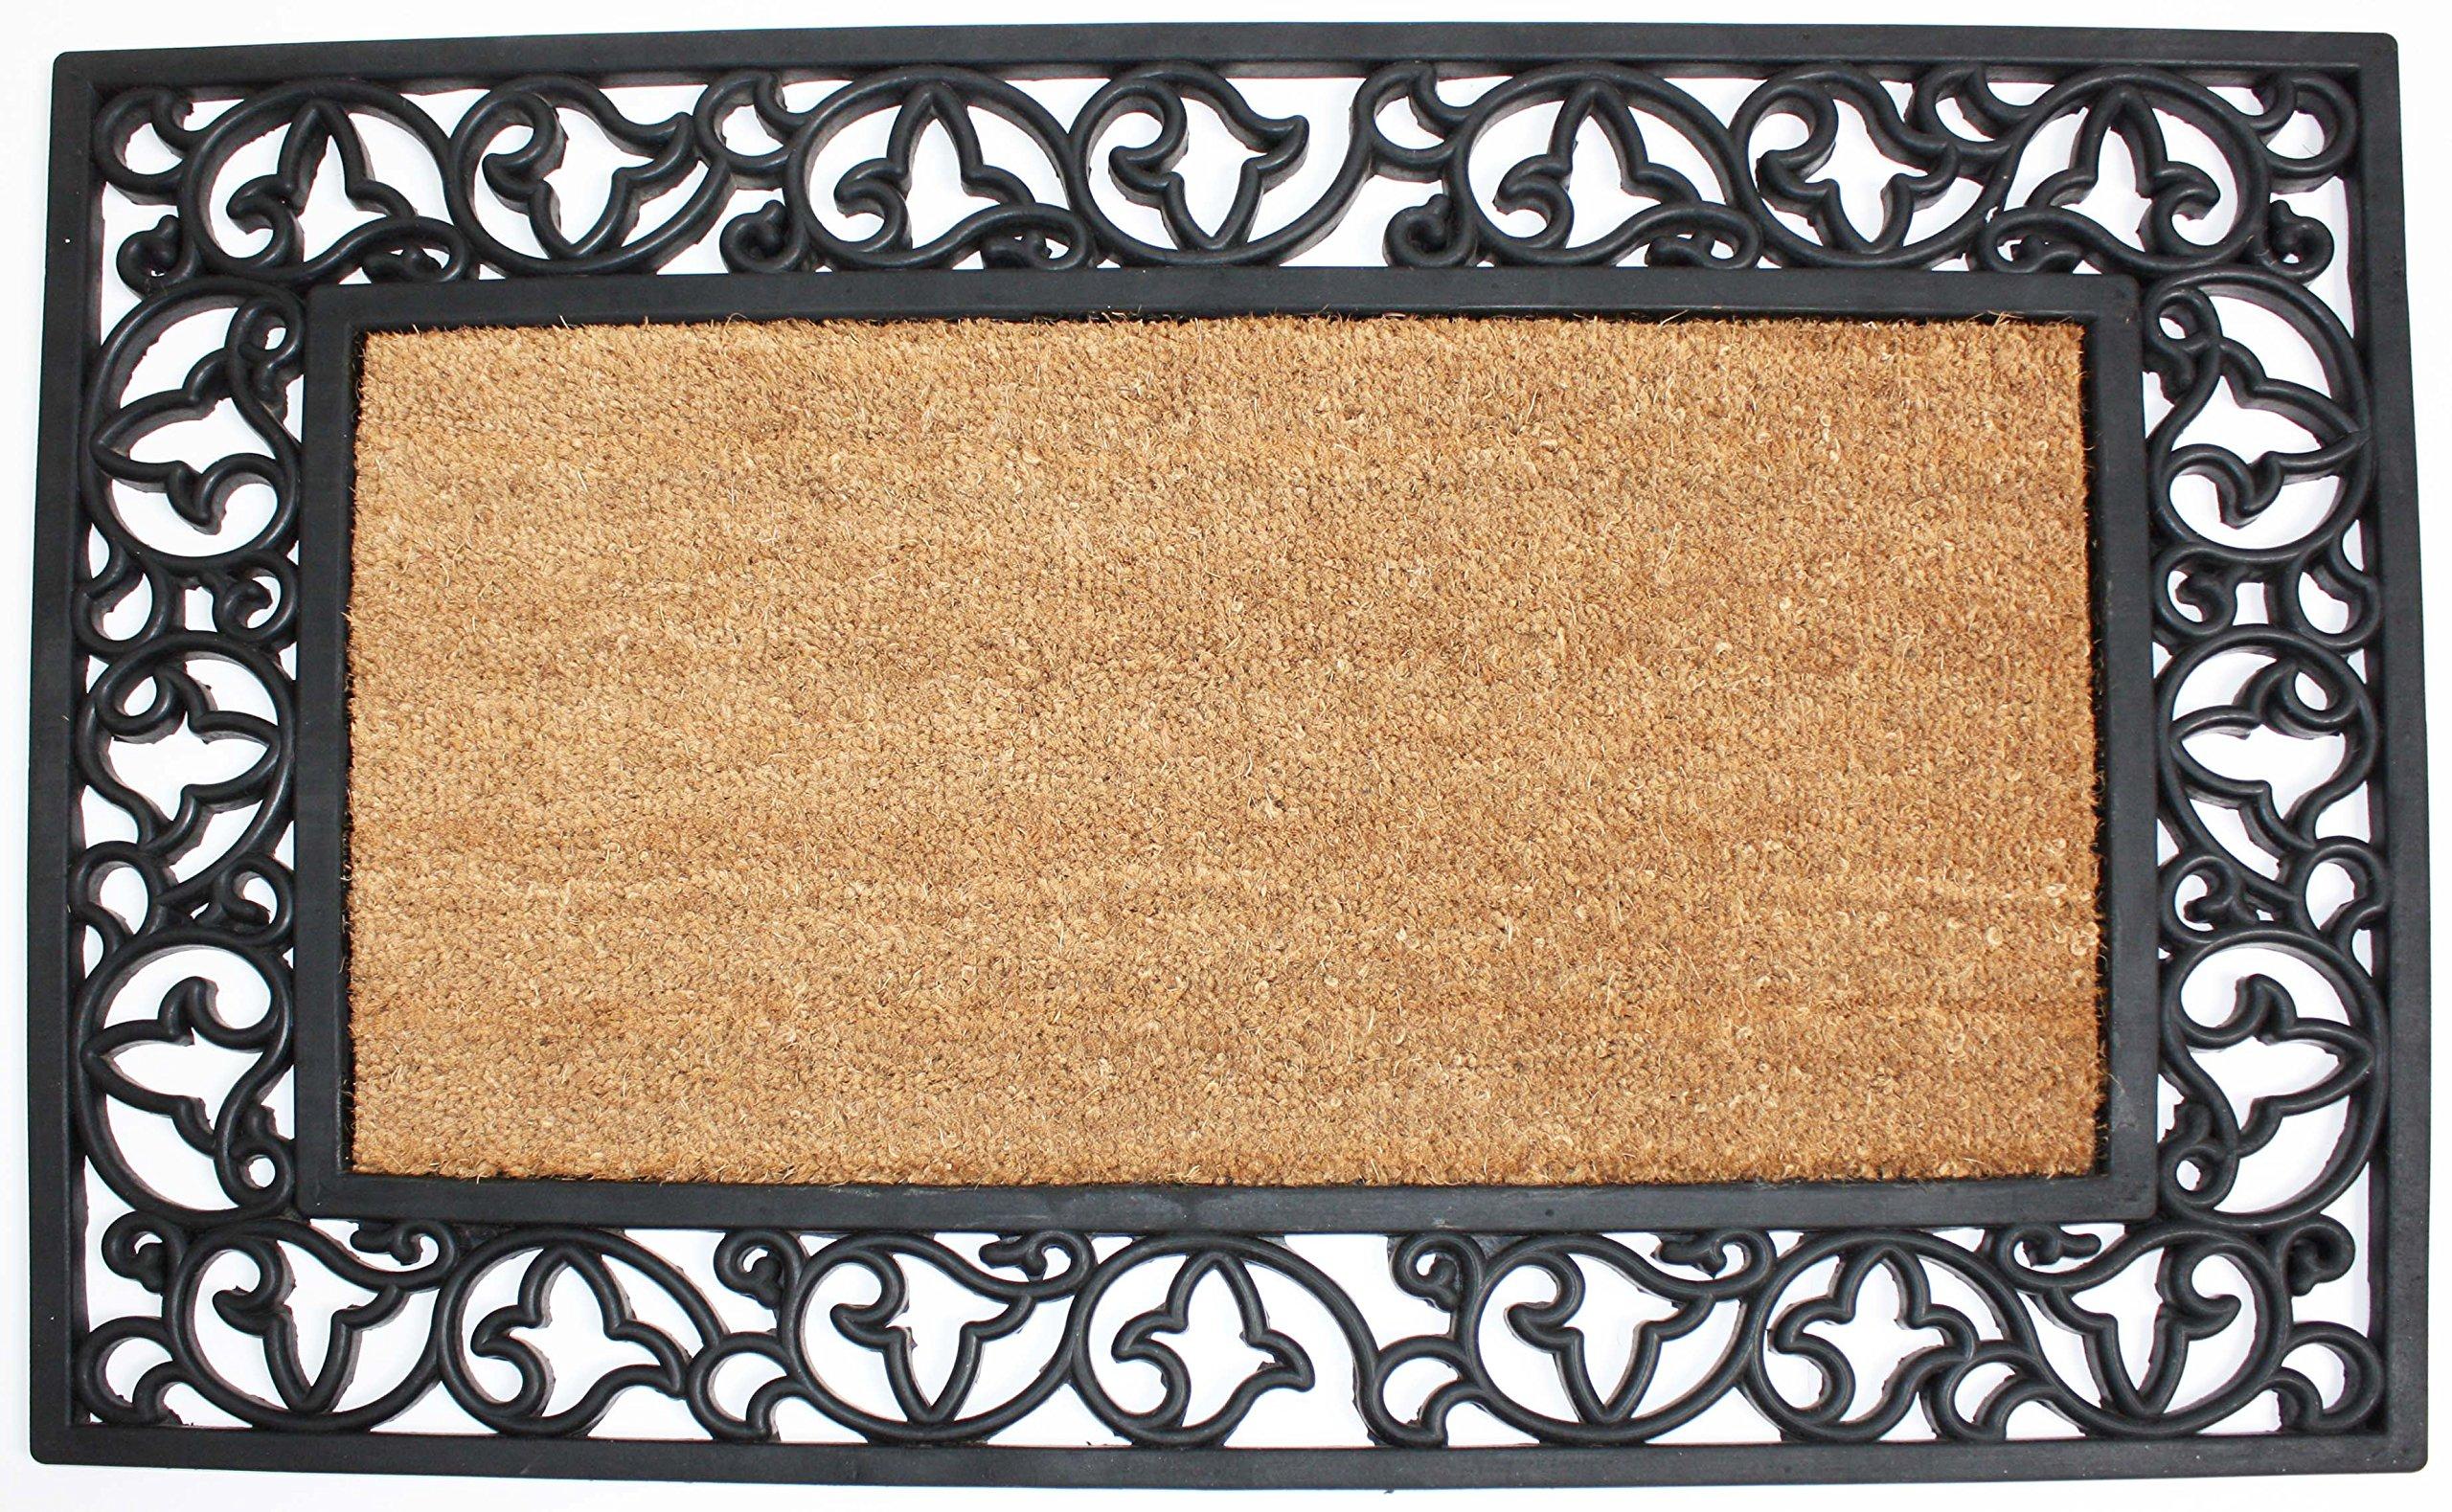 J&M Home Fashions Natural Coir Rubber Non-Slip Doormat, 24x40, Heavy Duty Entry Way Shoes Scraper Patio Rug Dirt Debris Mud Trapper Waterproof-Plain Rectangle